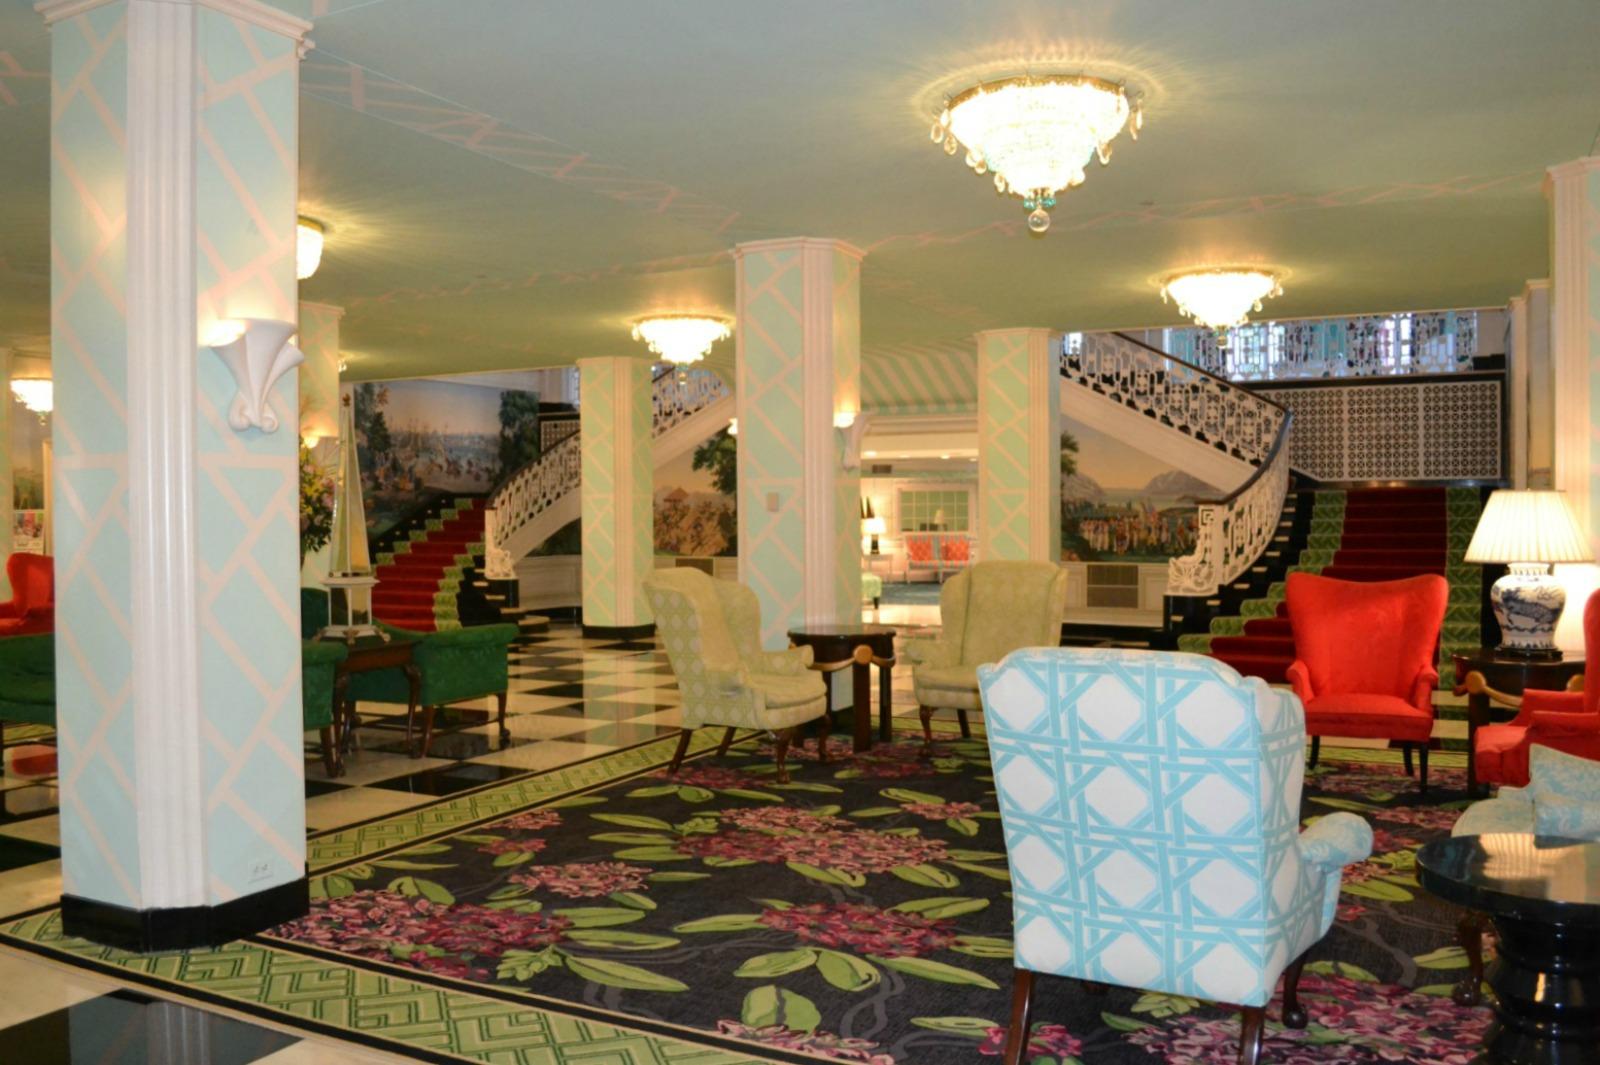 greenbrier resort, lobby, anniversary trip